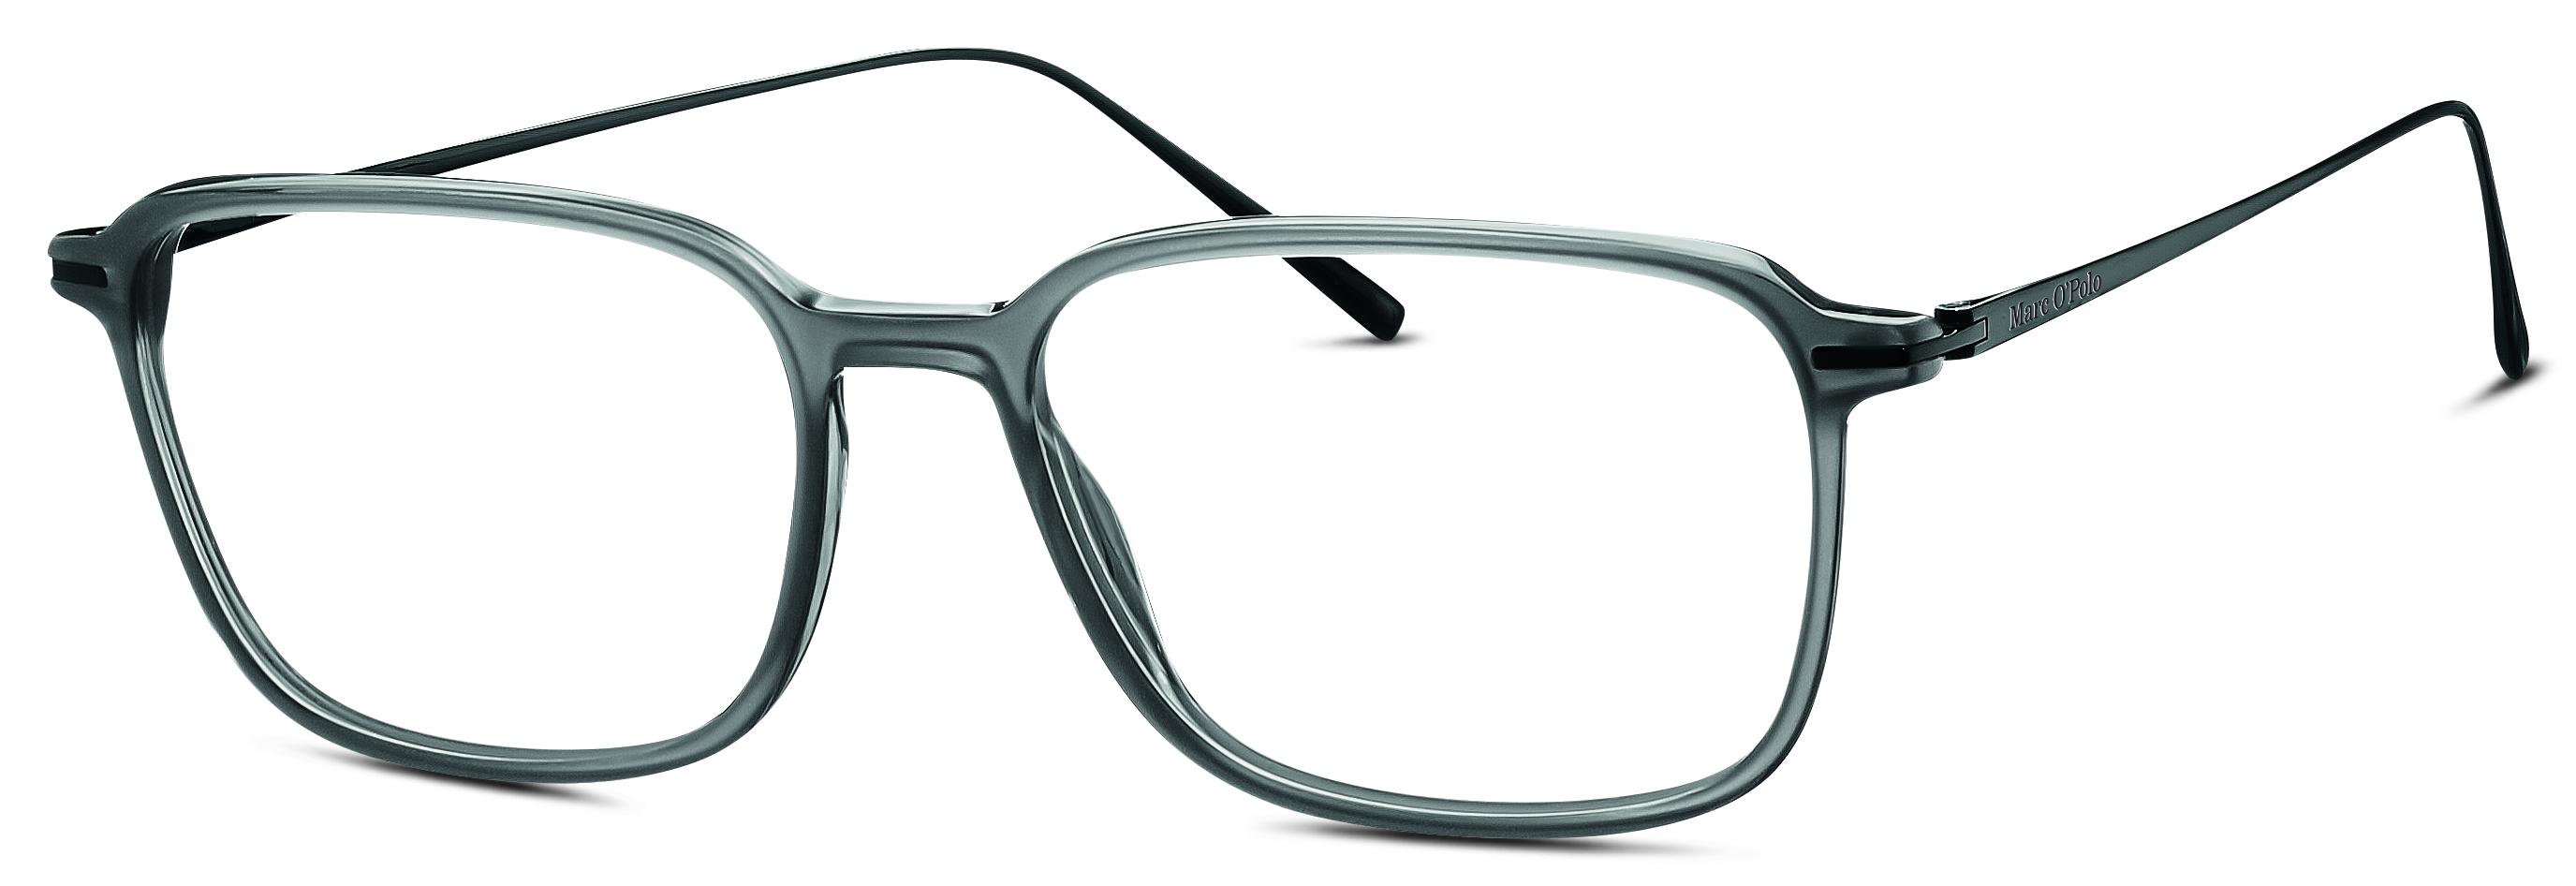 MARC O'POLO Eyewear 503153 30